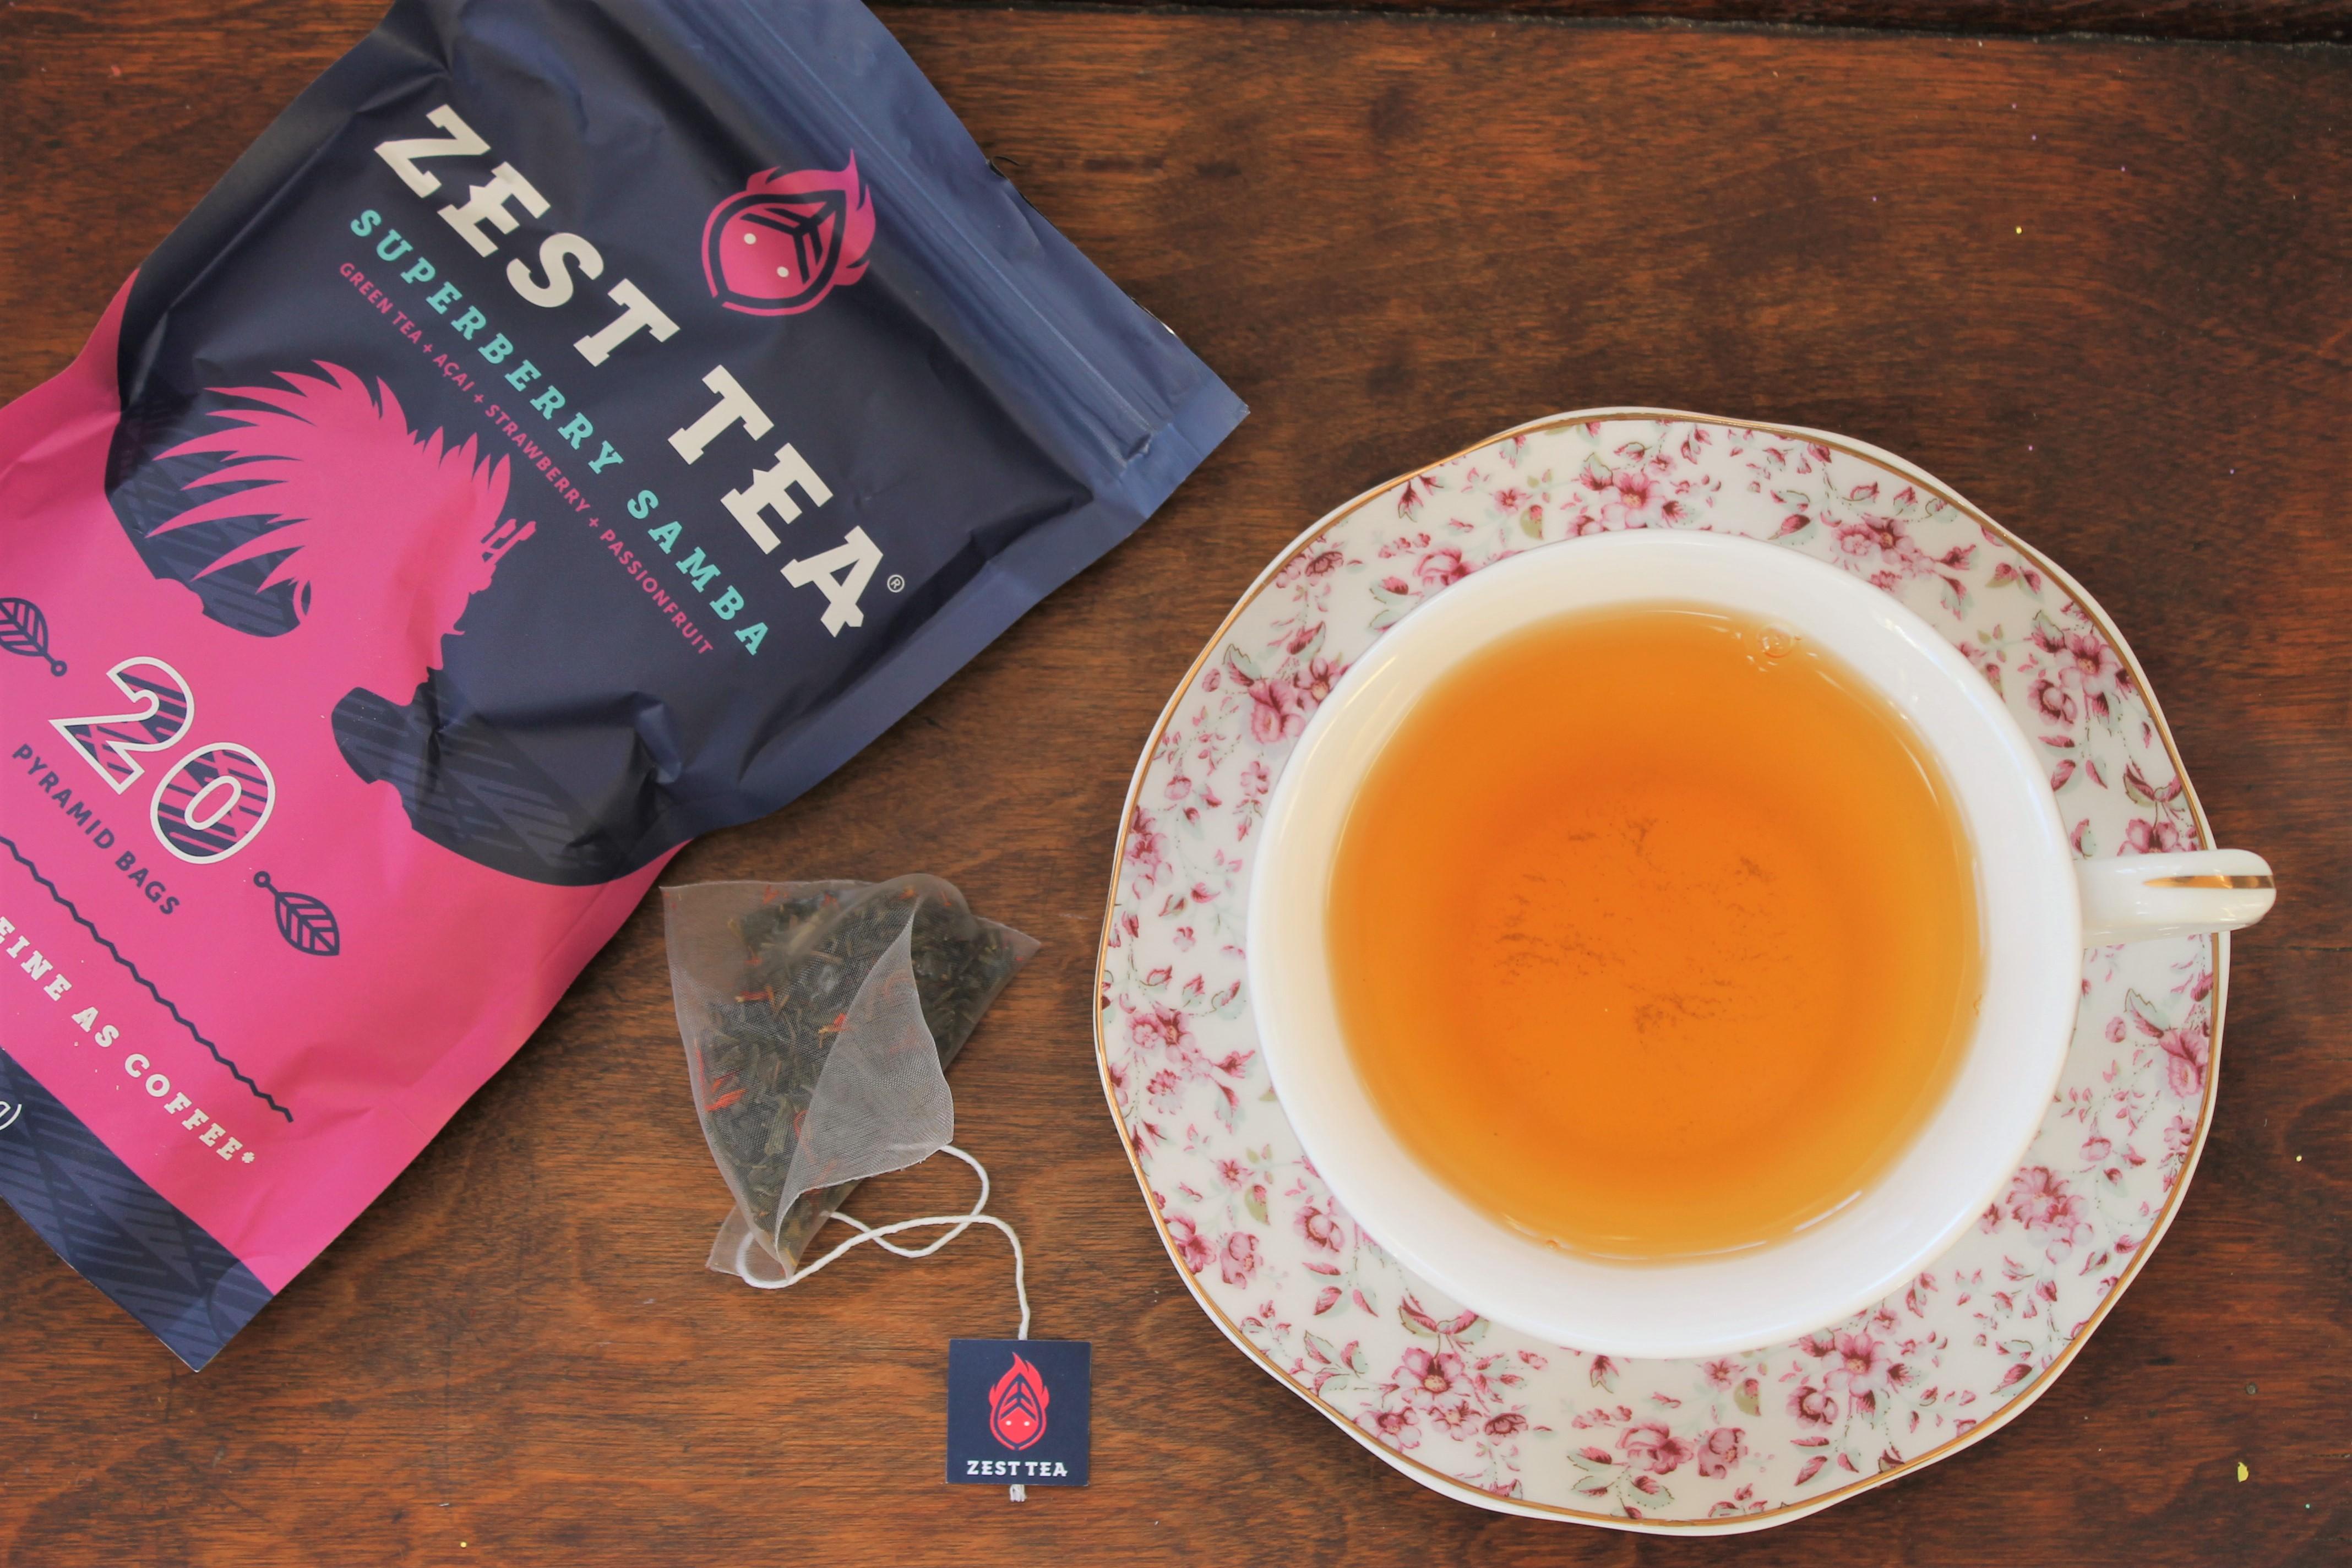 Zest Tea Superberry Samba Review